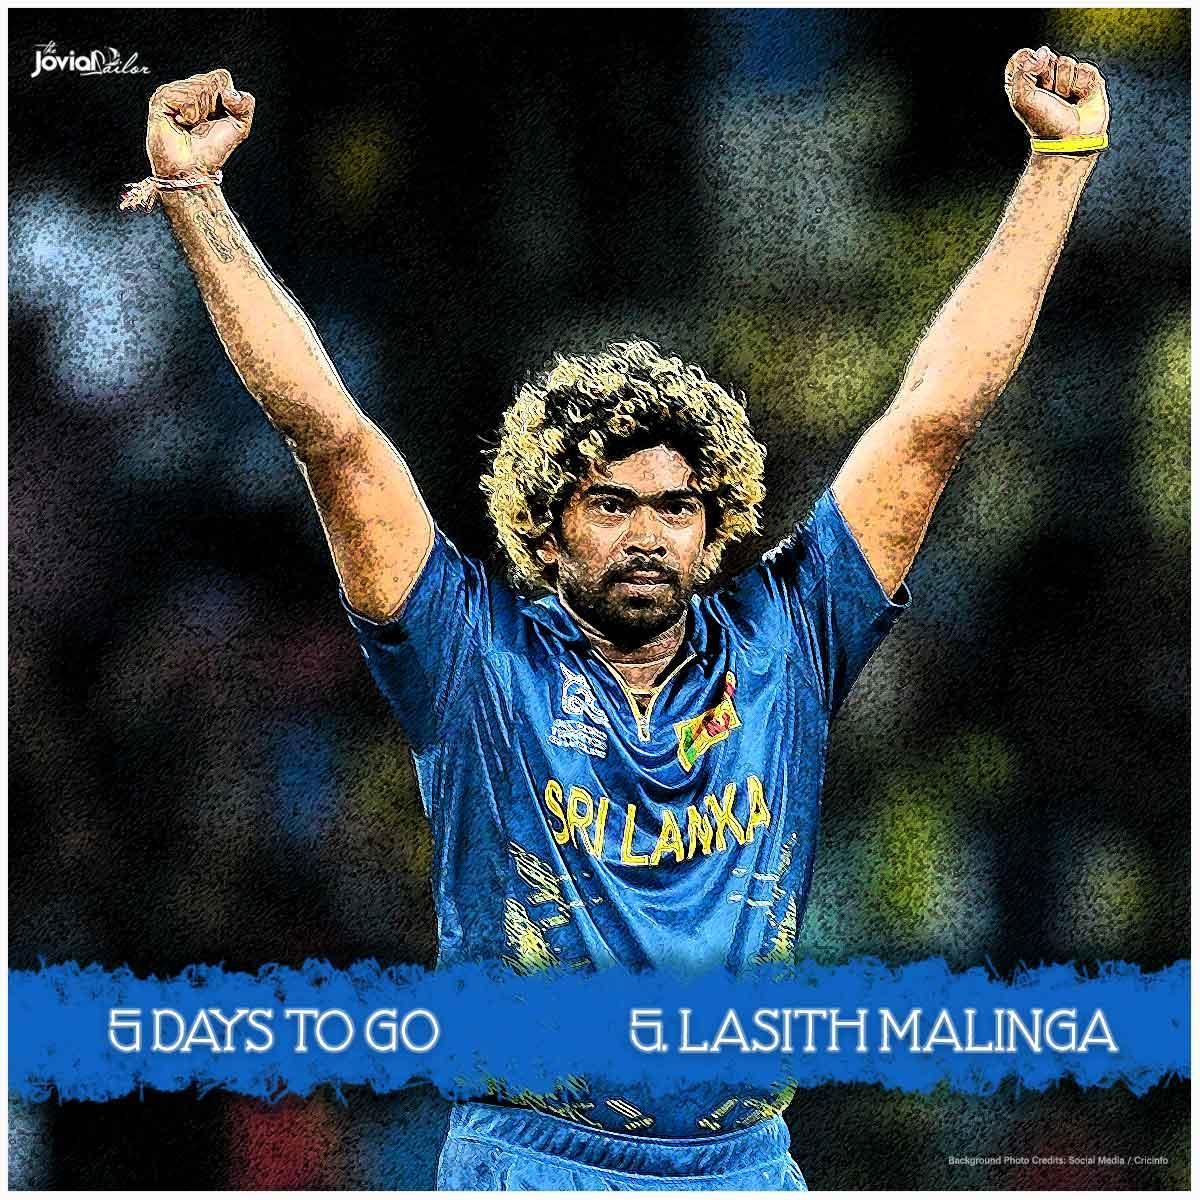 Lasith Malinga Picks 5 Wickets Against England at World Twenty20 2012